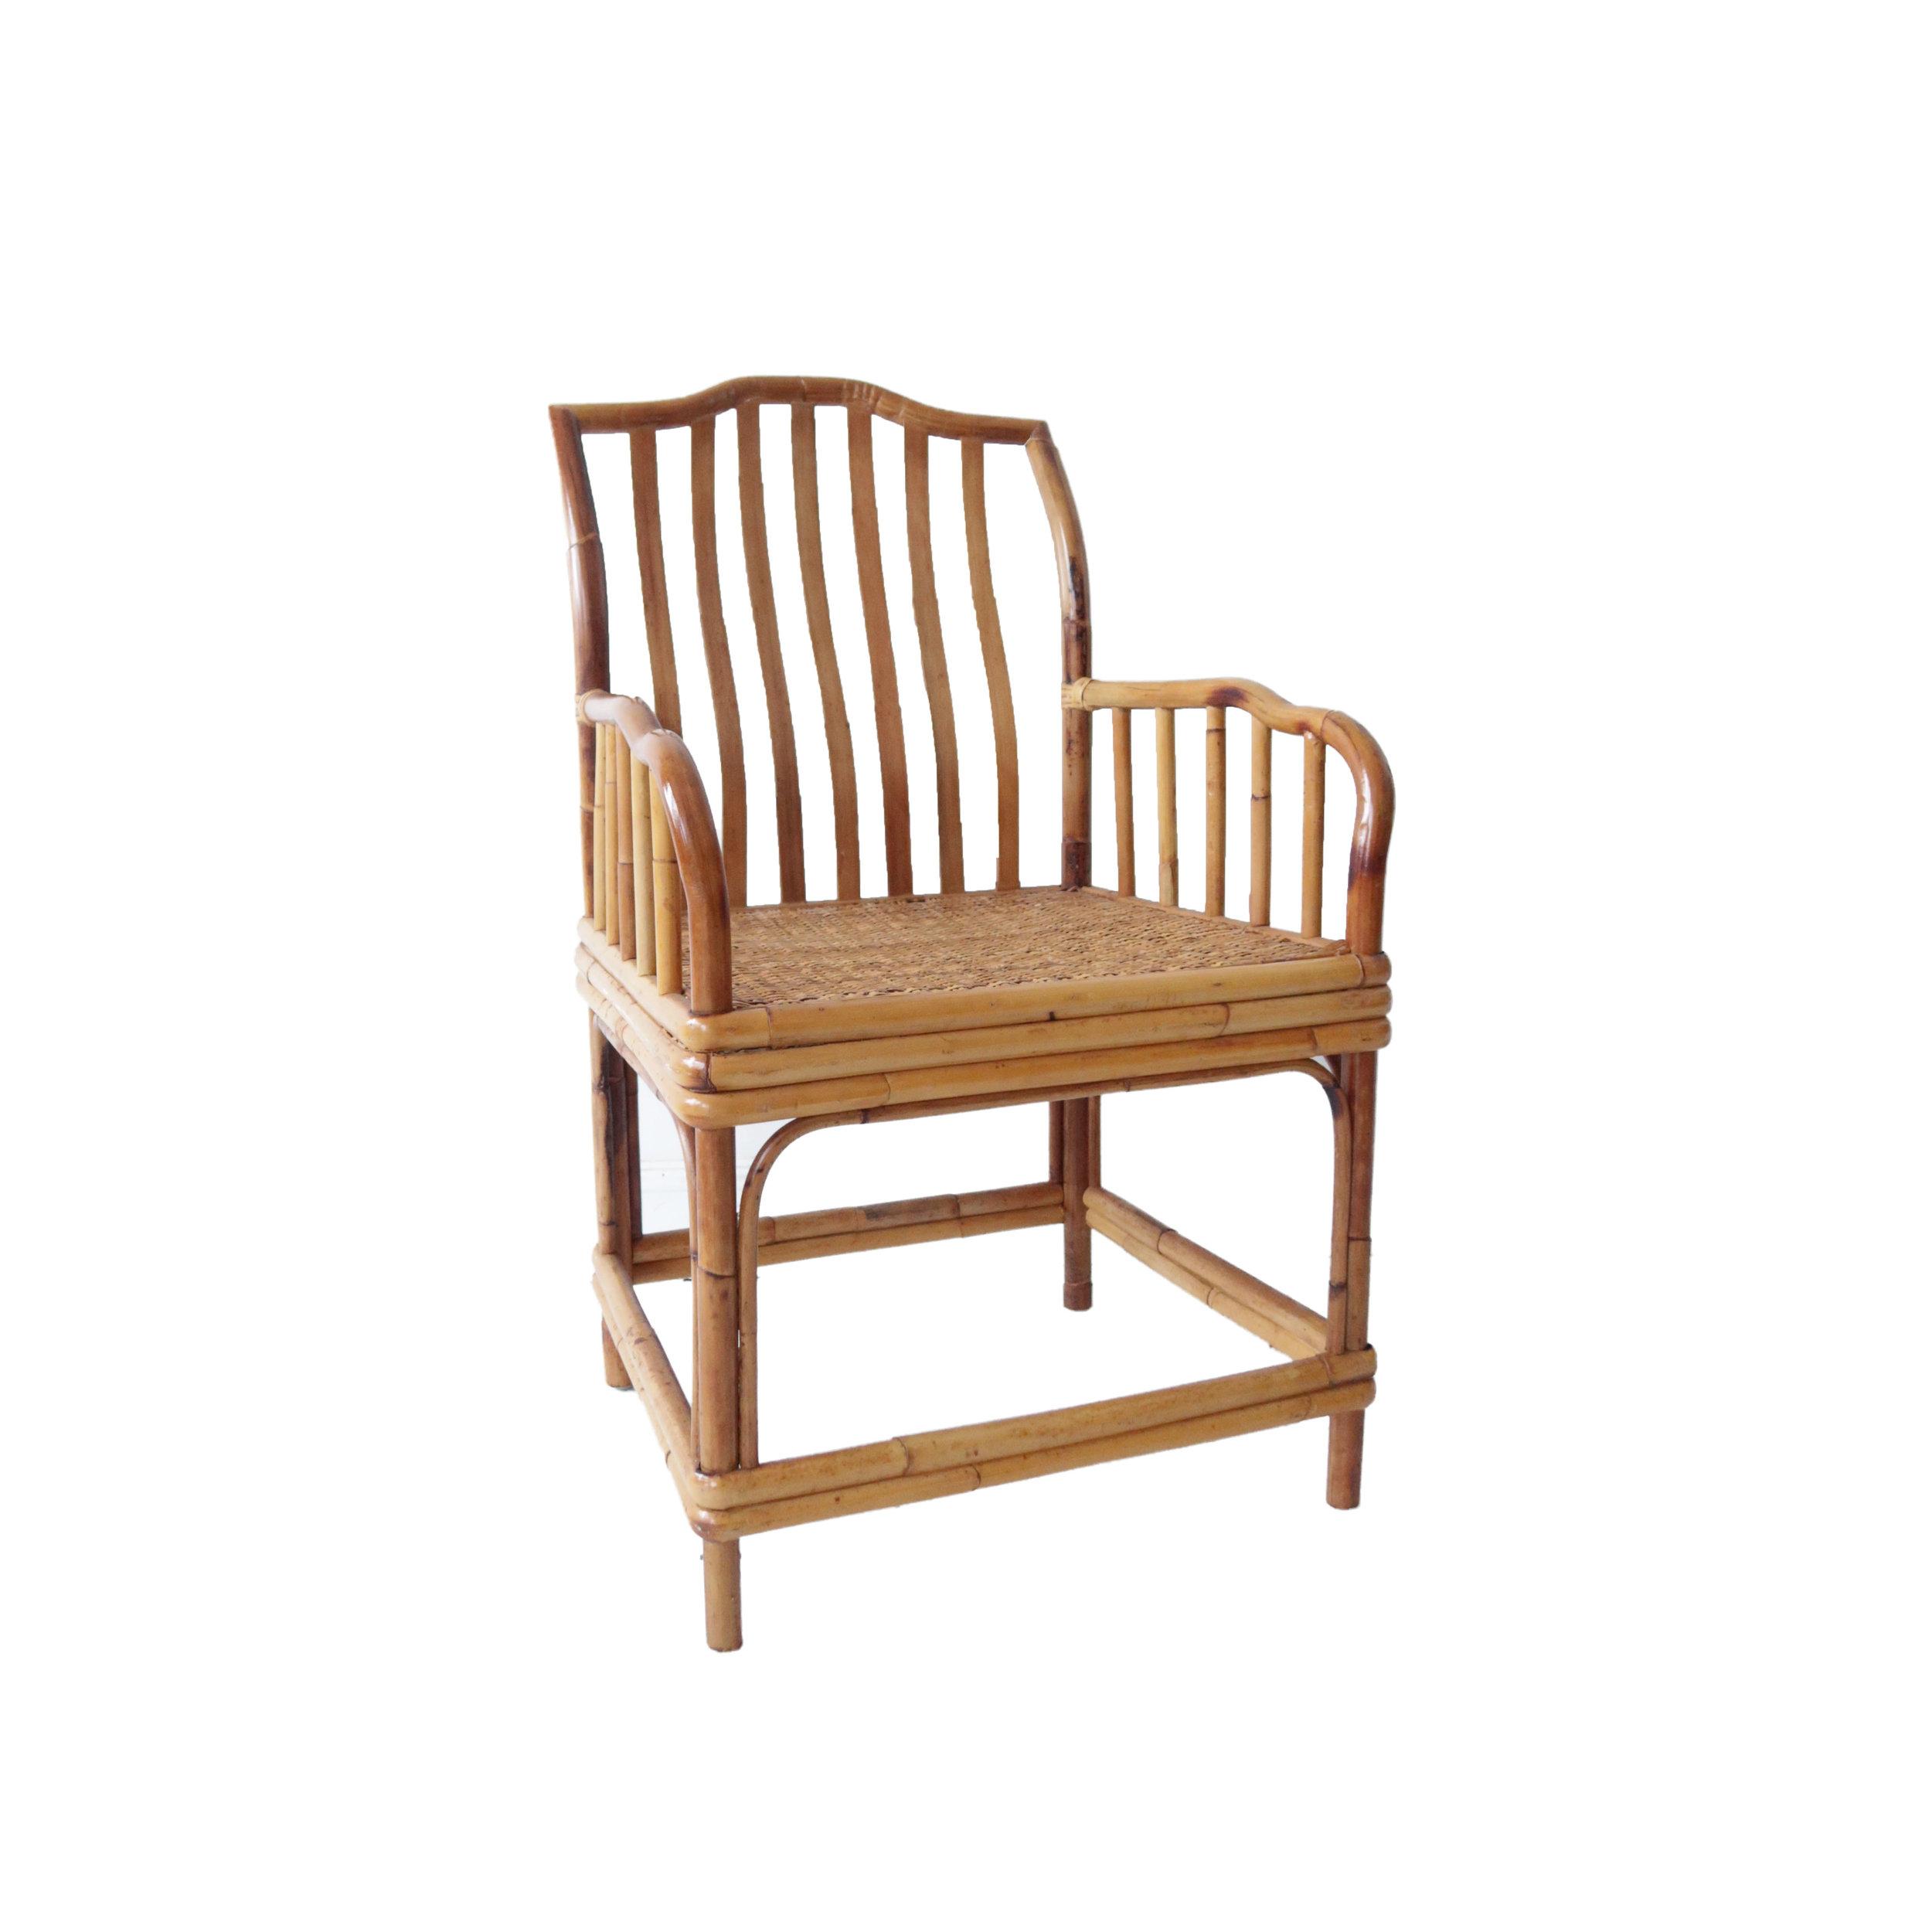 vintage bamboo arm chair.jpg